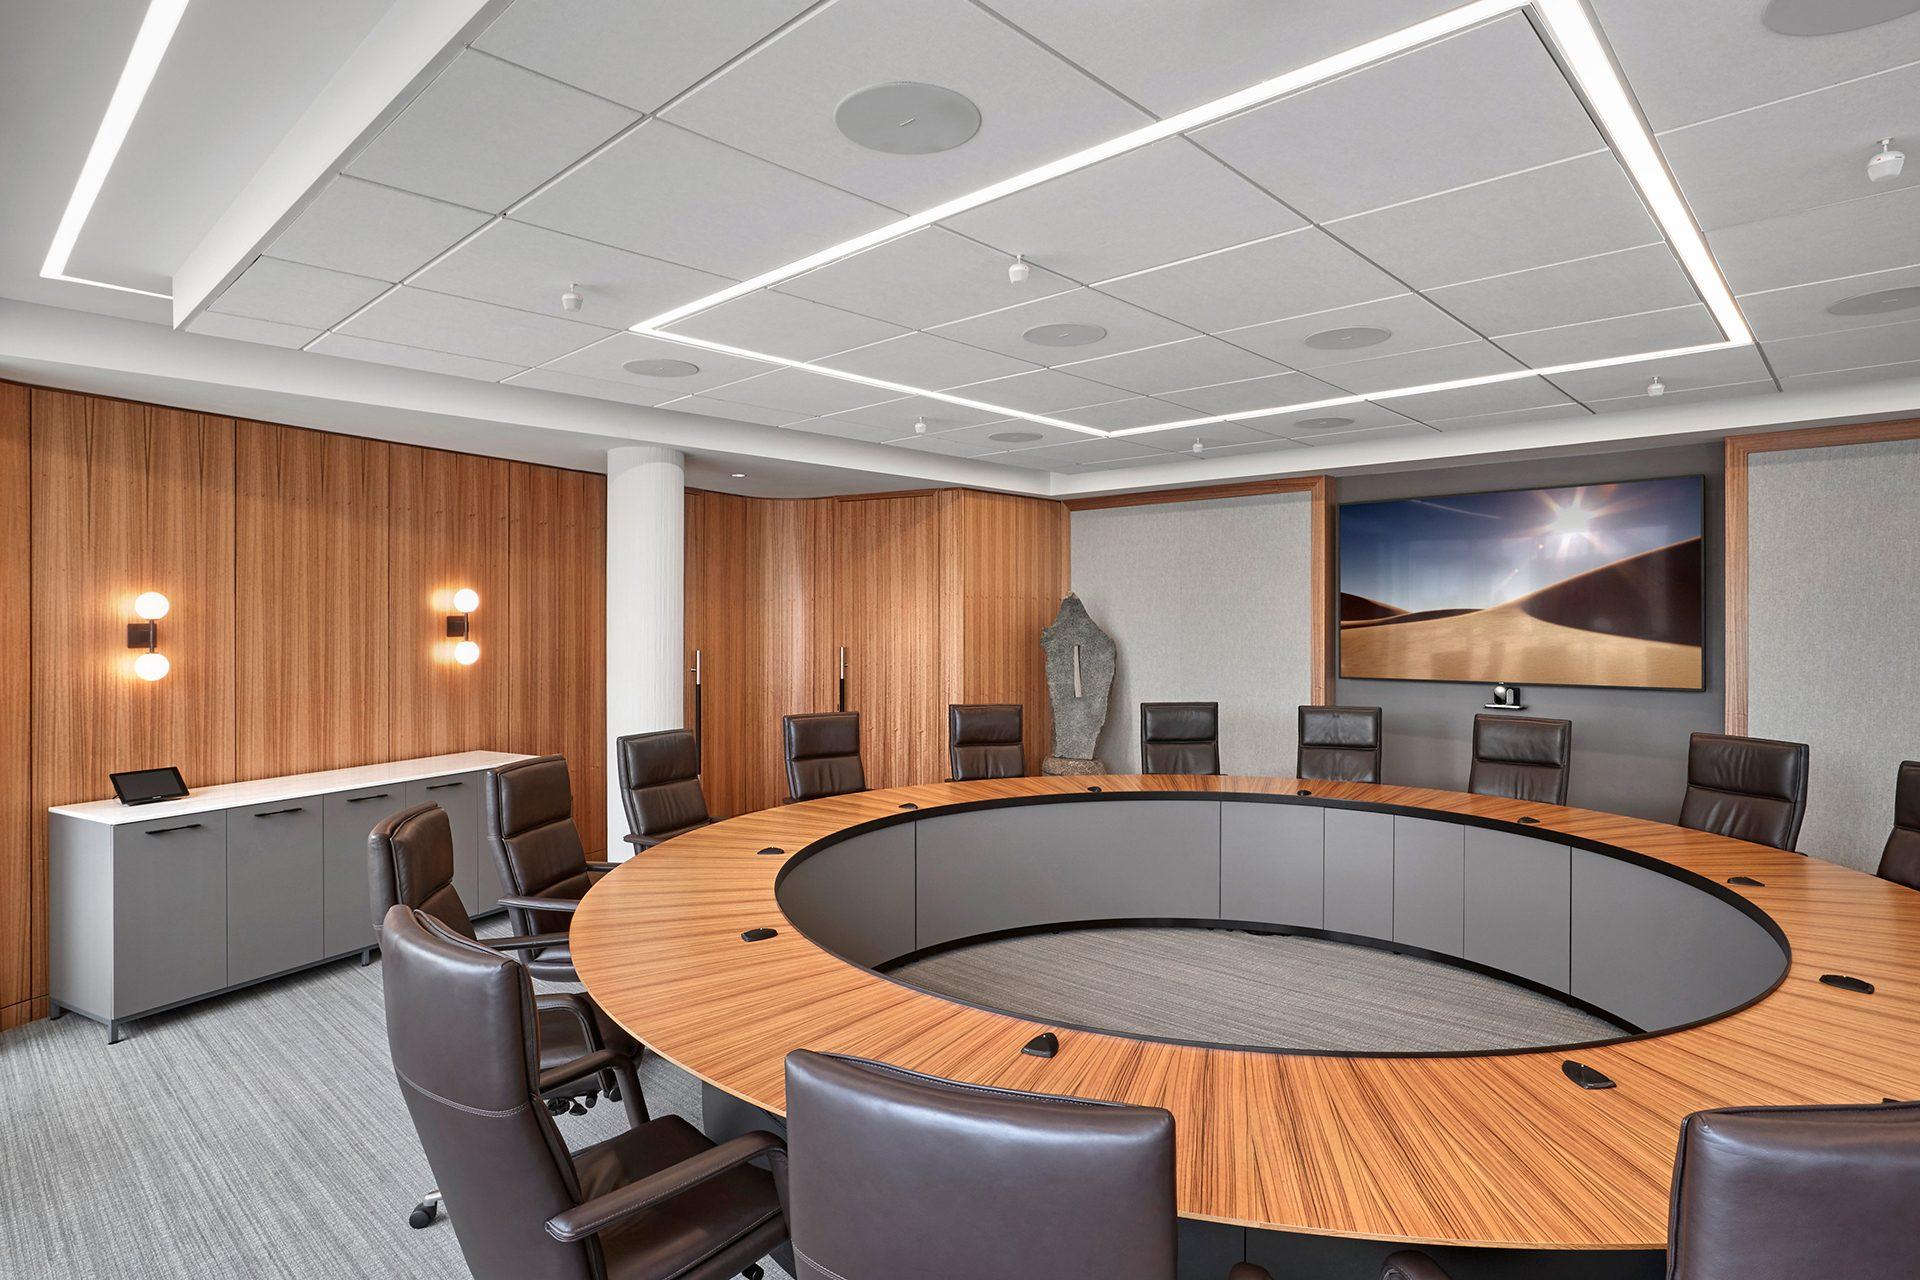 Energy Capital Partners (ECP) board room with custom table